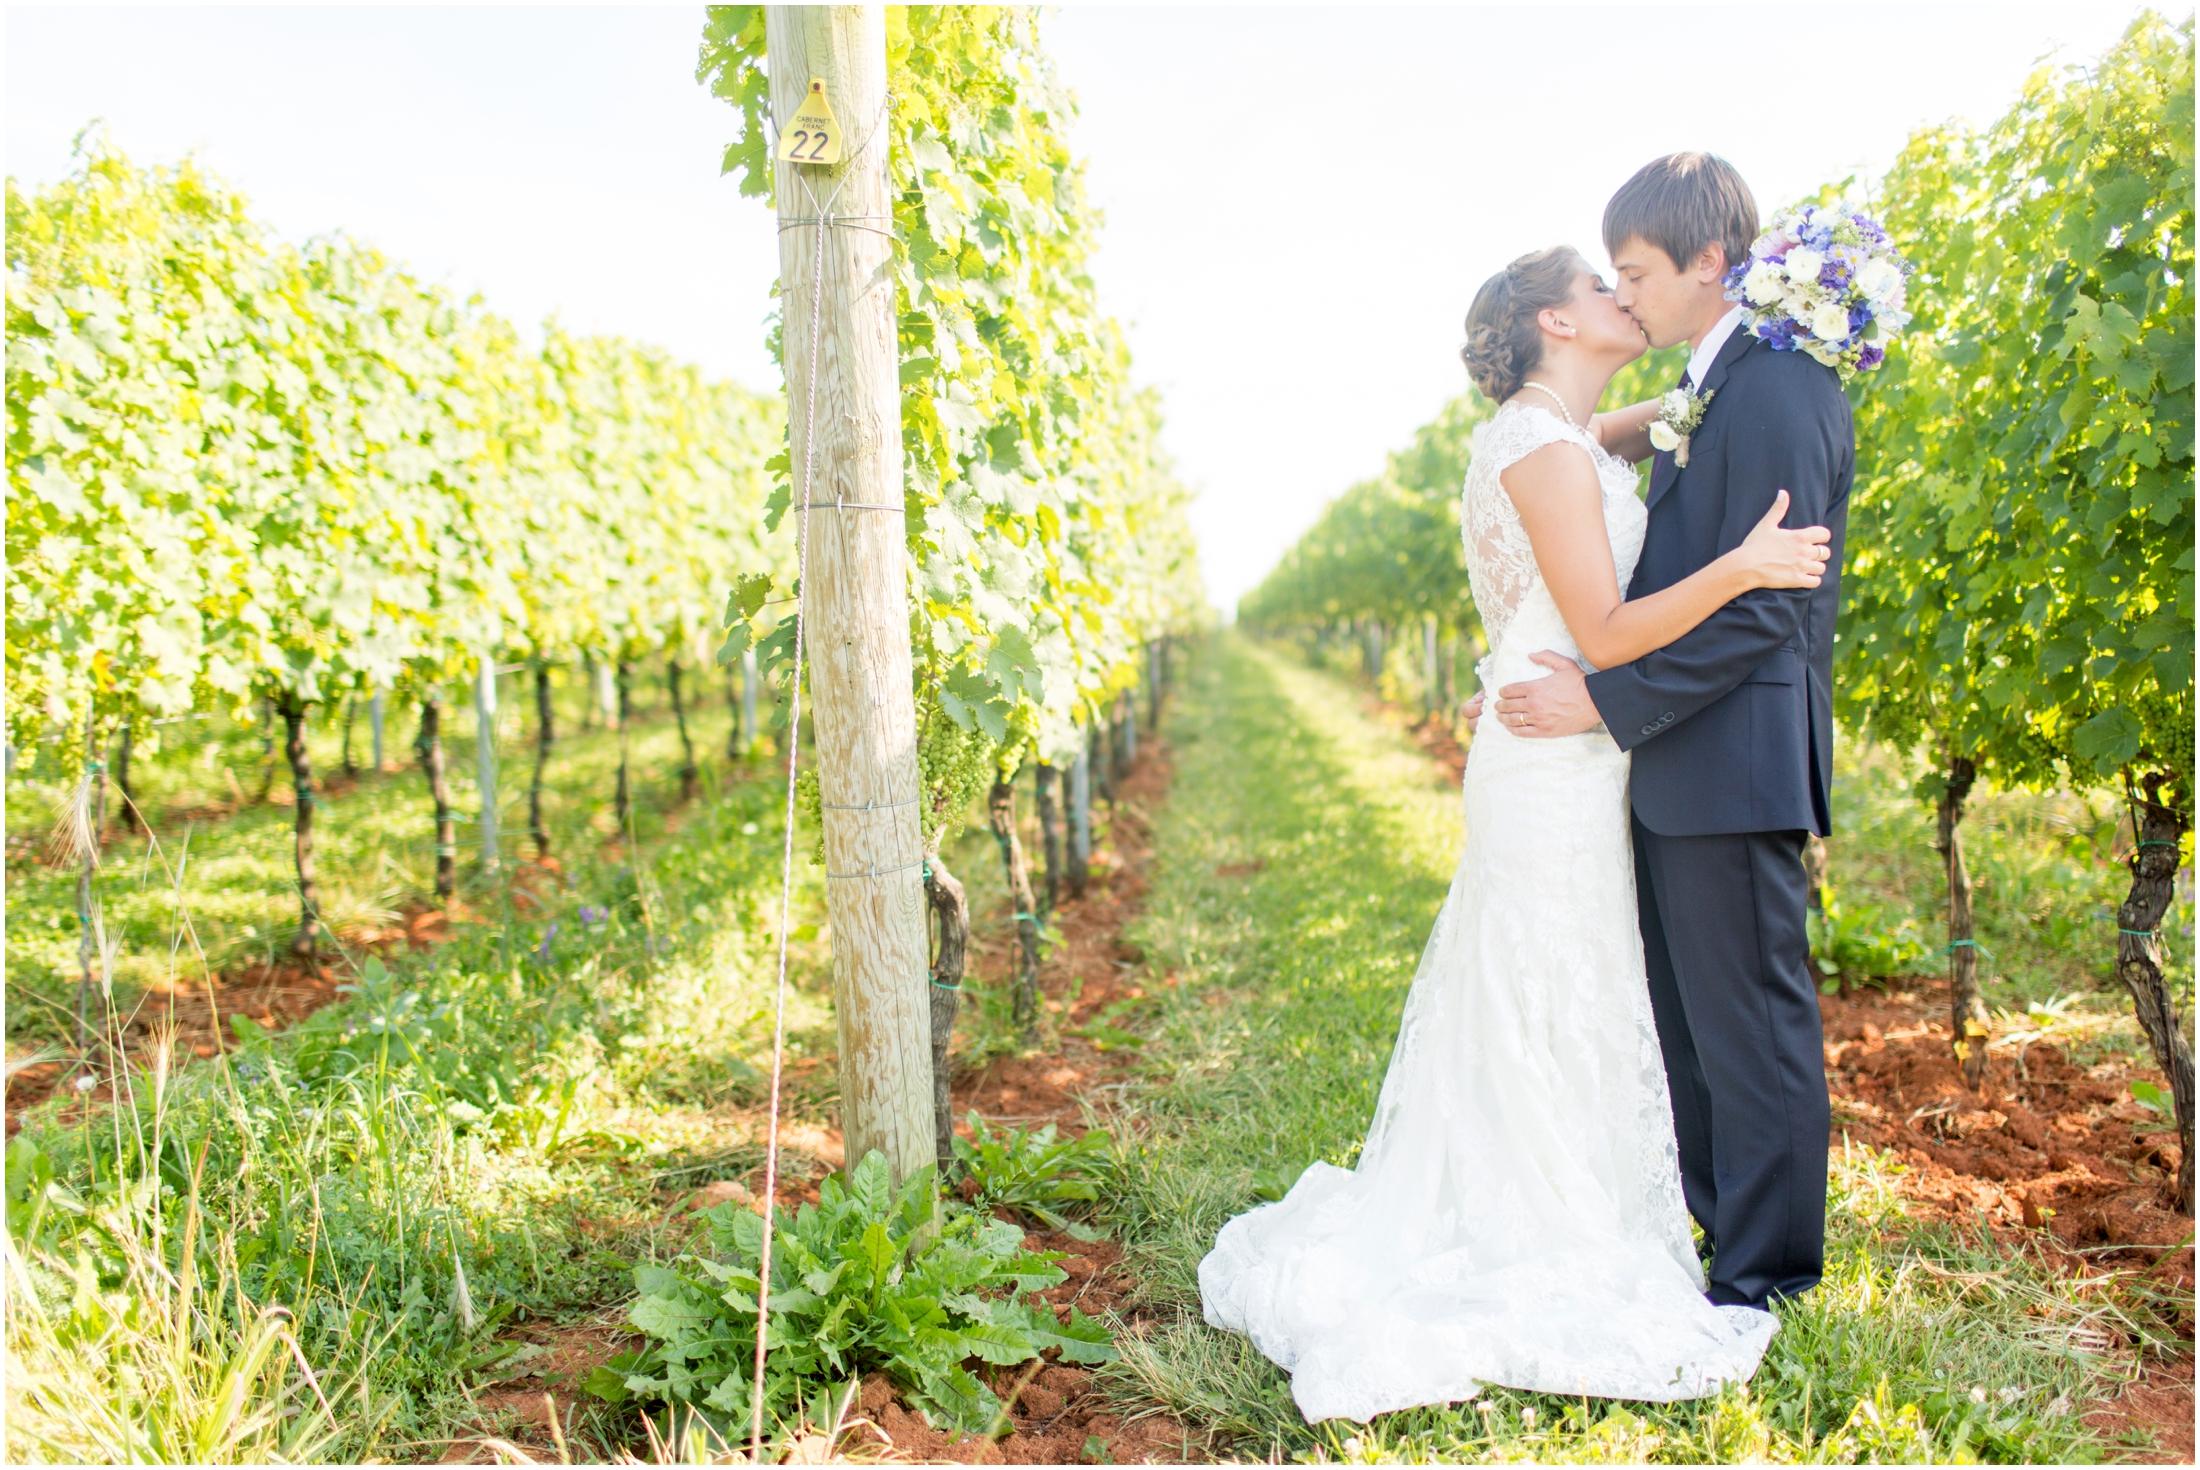 Norton-Wedding-3-Bride-and-Groom-Portraits-811.jpg